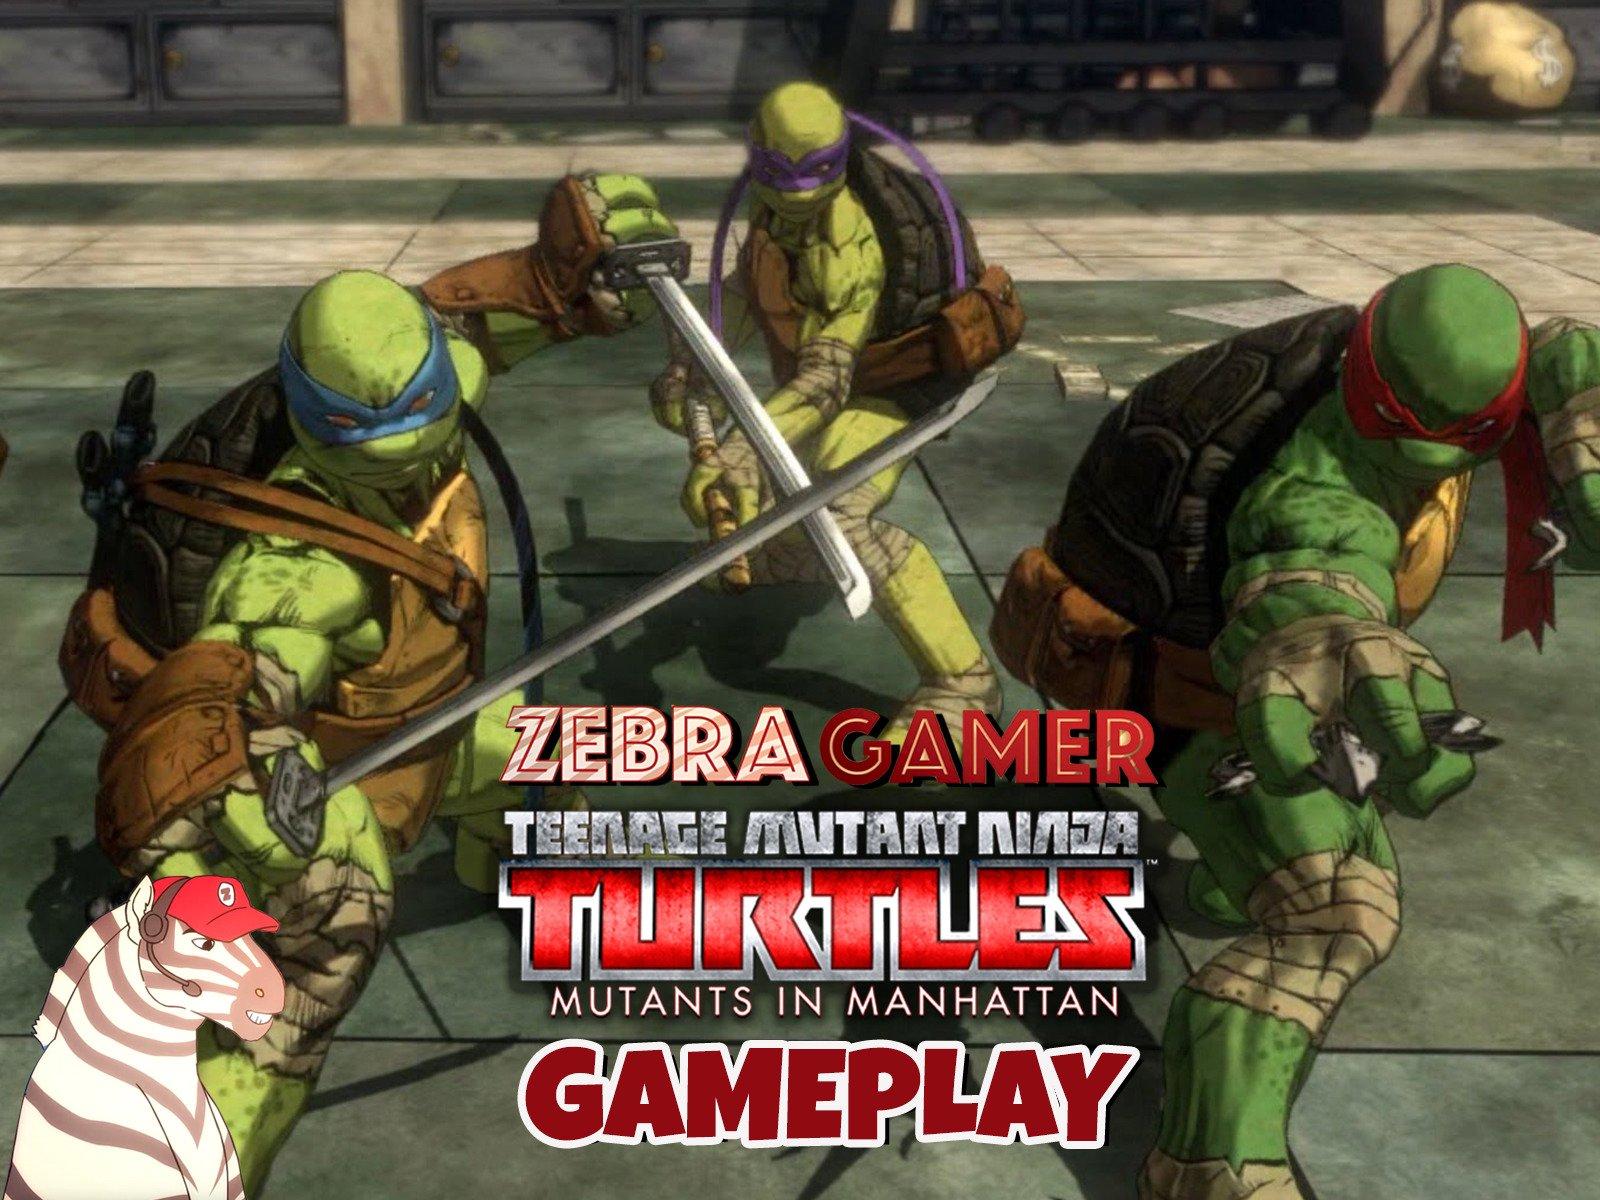 Teenage Mutant Ninja Turtles: Mutants in Manhattan Gameplay - Season 1